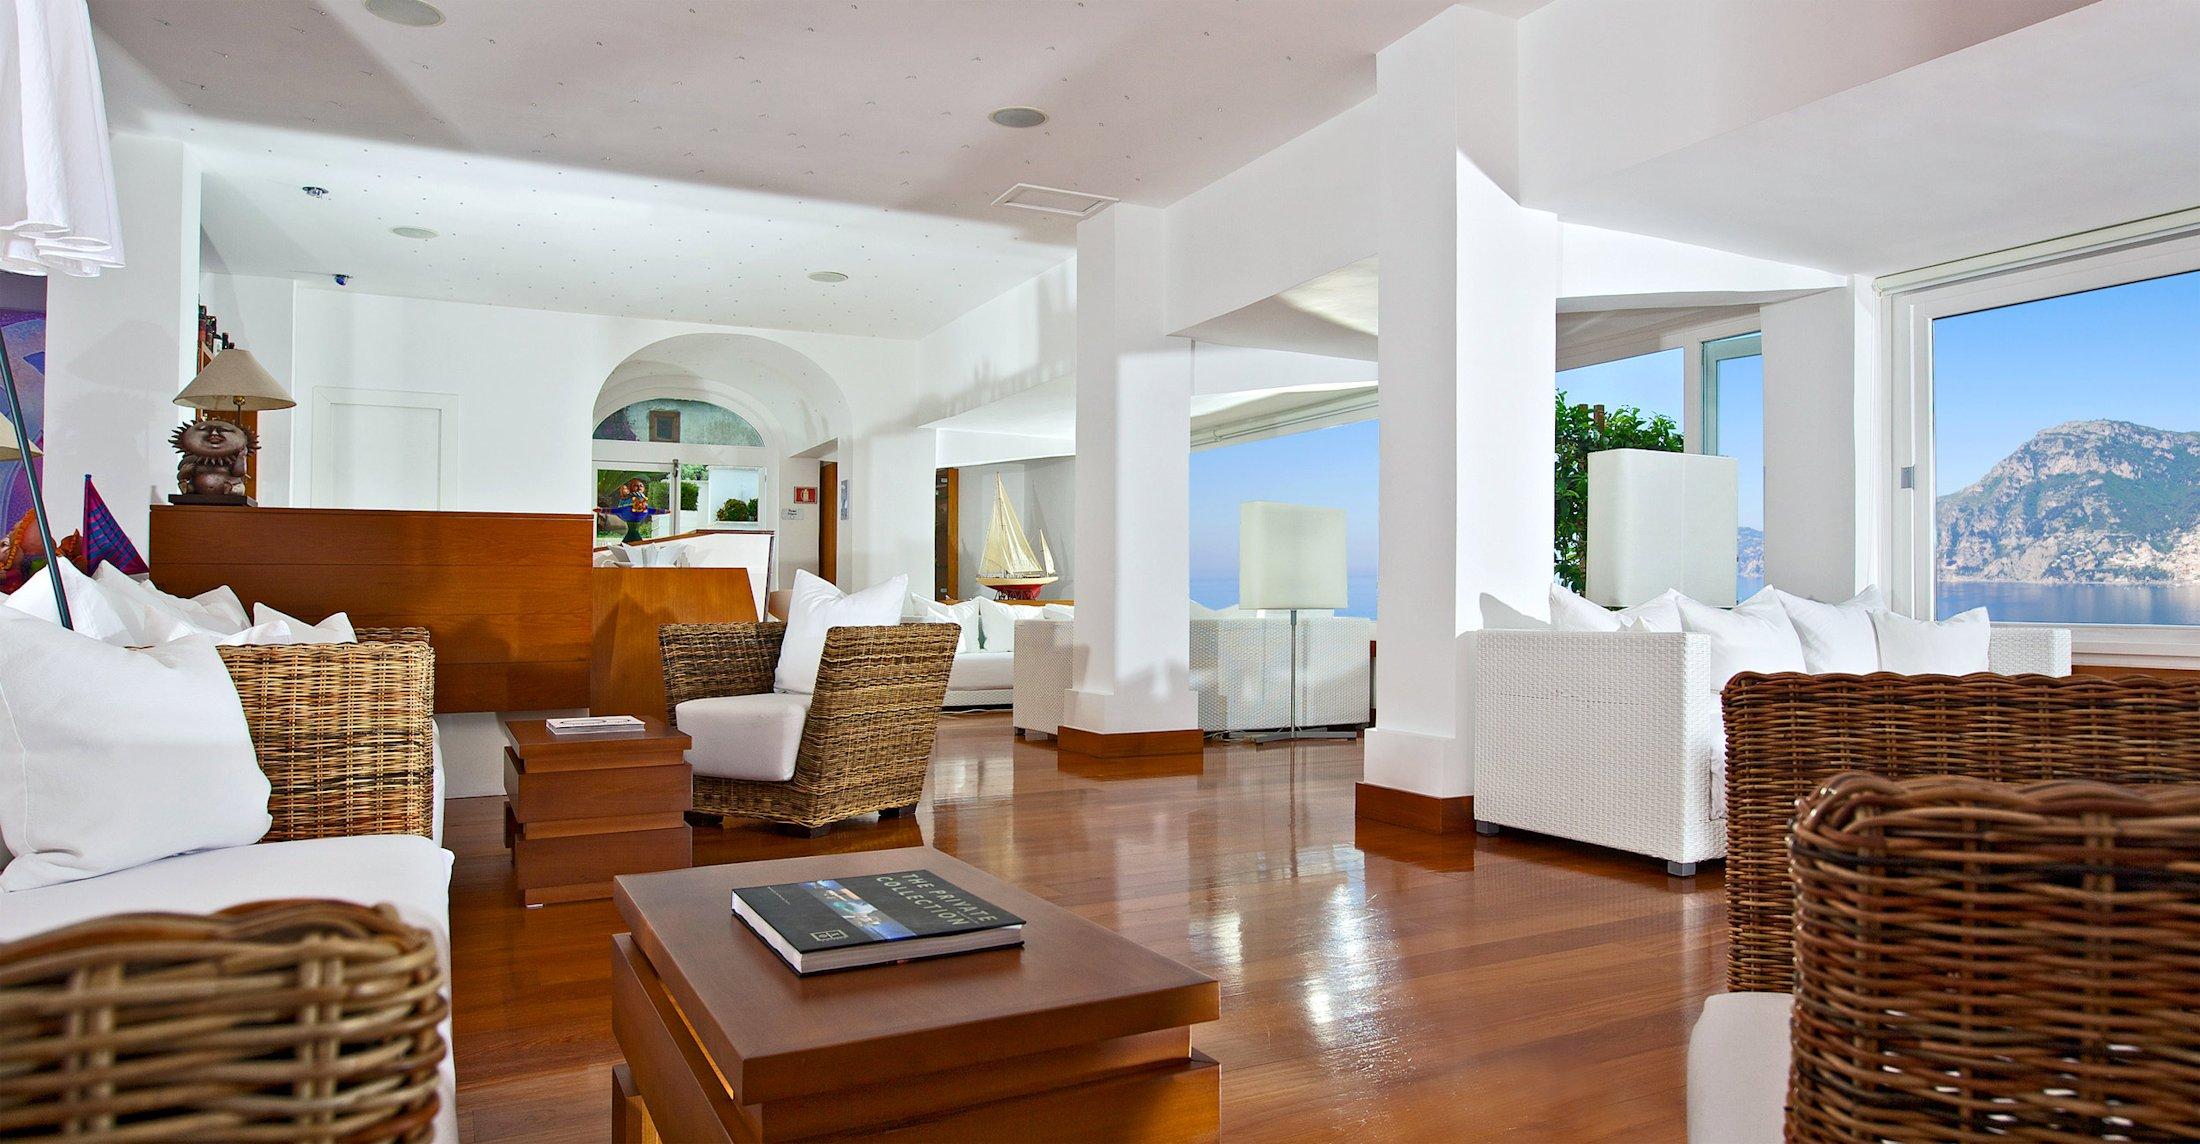 Un salon de l'hotel Casa Angelina, Praiano sur la Cote Amalfitaine